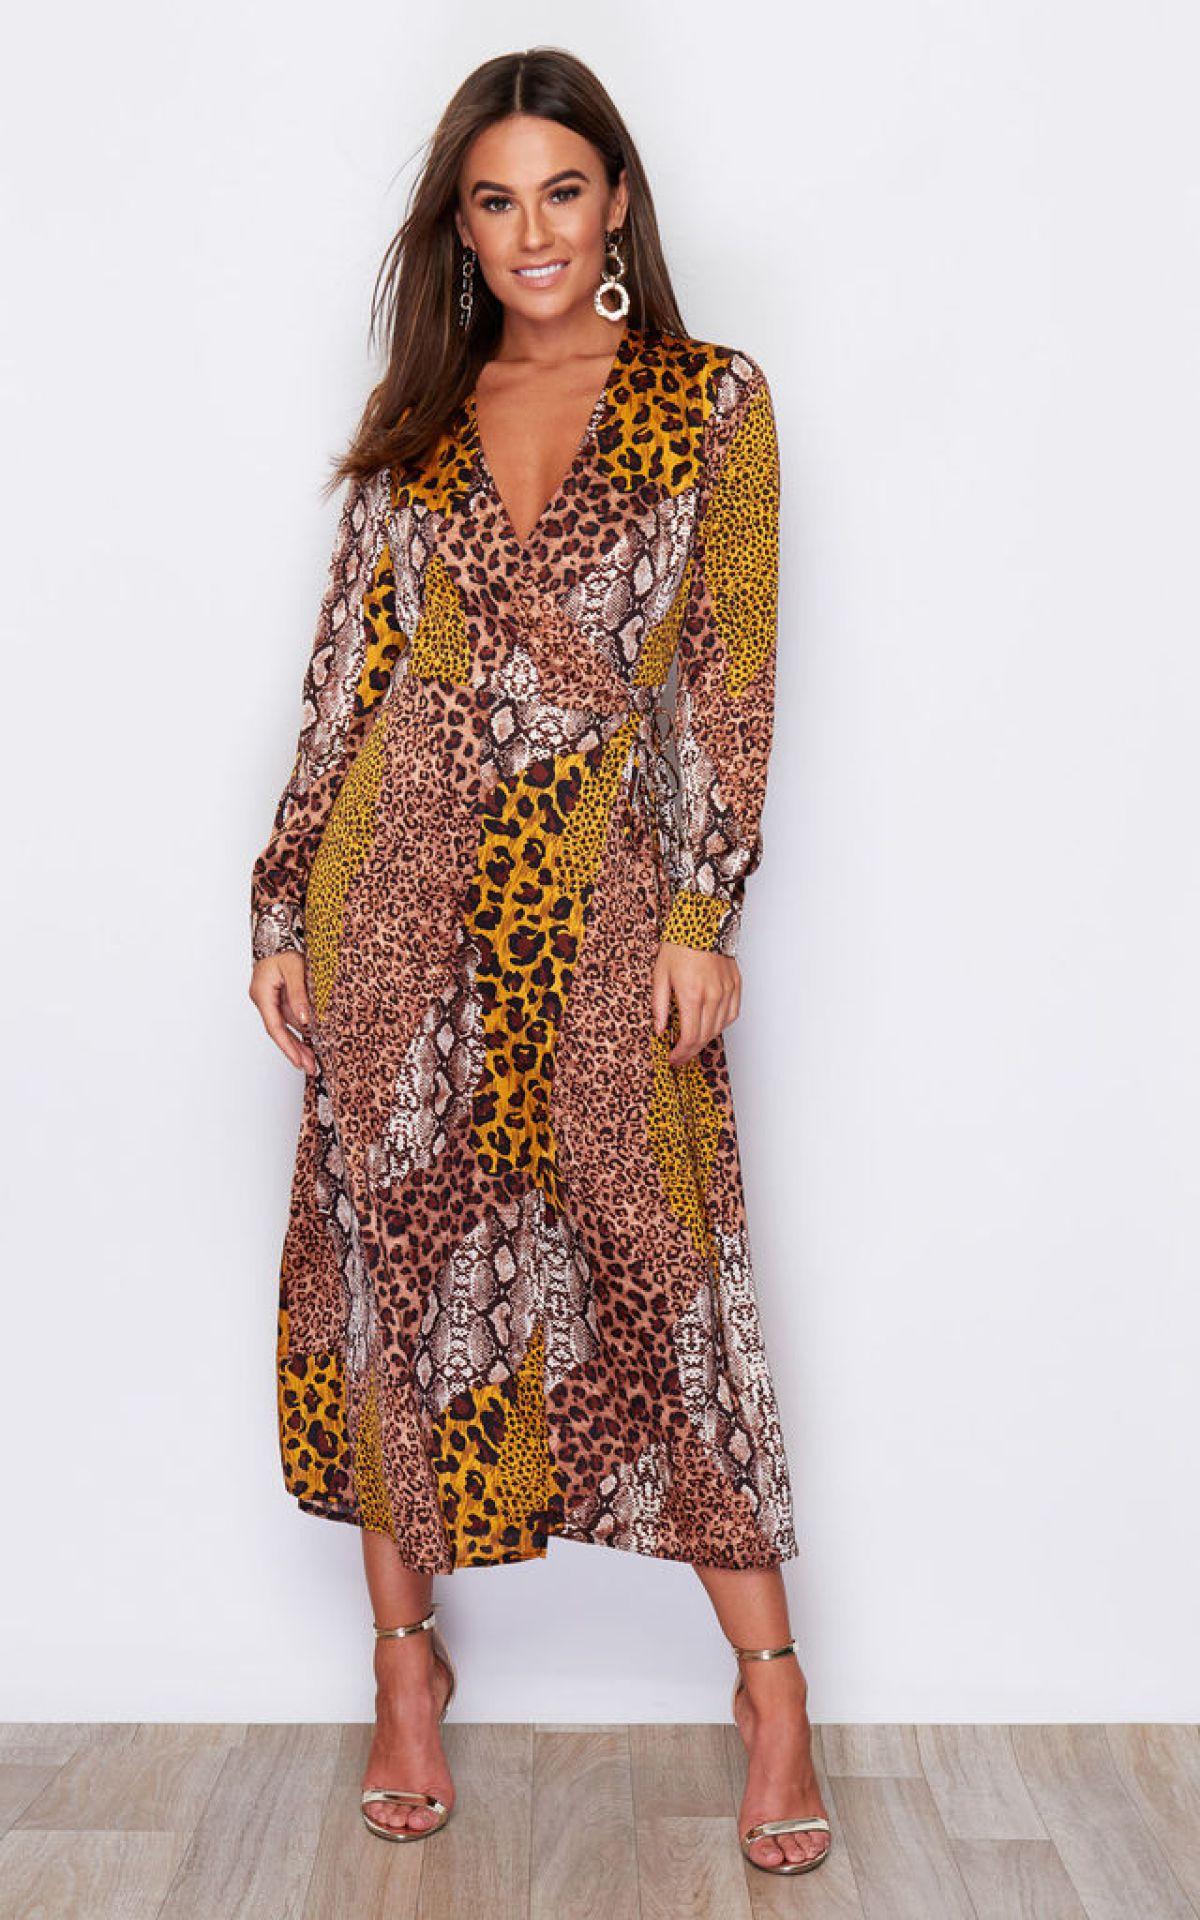 adrianna-tie-waist-long-sleeve-wrap-midaxi-dress-animal-print-summer-sale